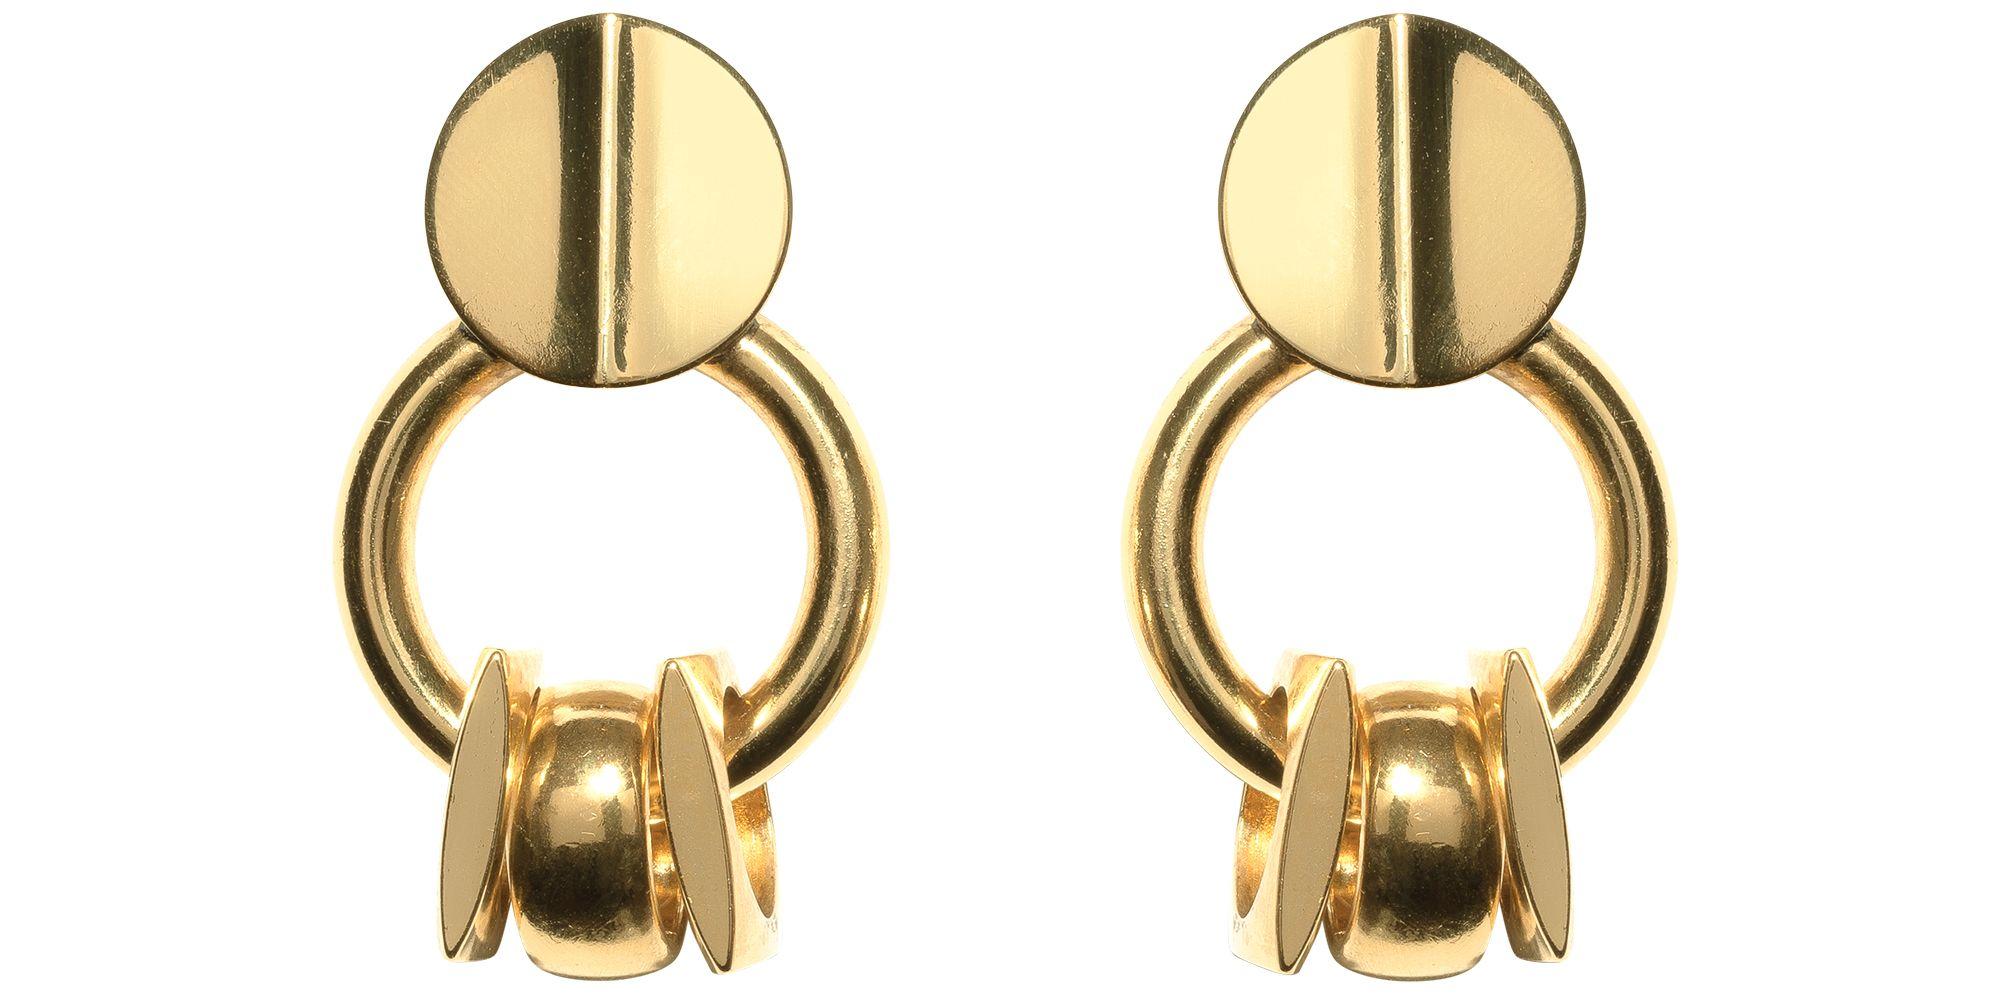 "<p><strong>Lizzie Fortunato </strong>earrings, $150, <a href=""https://shop.harpersbazaar.com/Designers/L/Lizzie-Fortunato/Retro-Gold-Earrings-5722.html"" target=""_blank"">shopBAZAAR.com</a>.</p>"